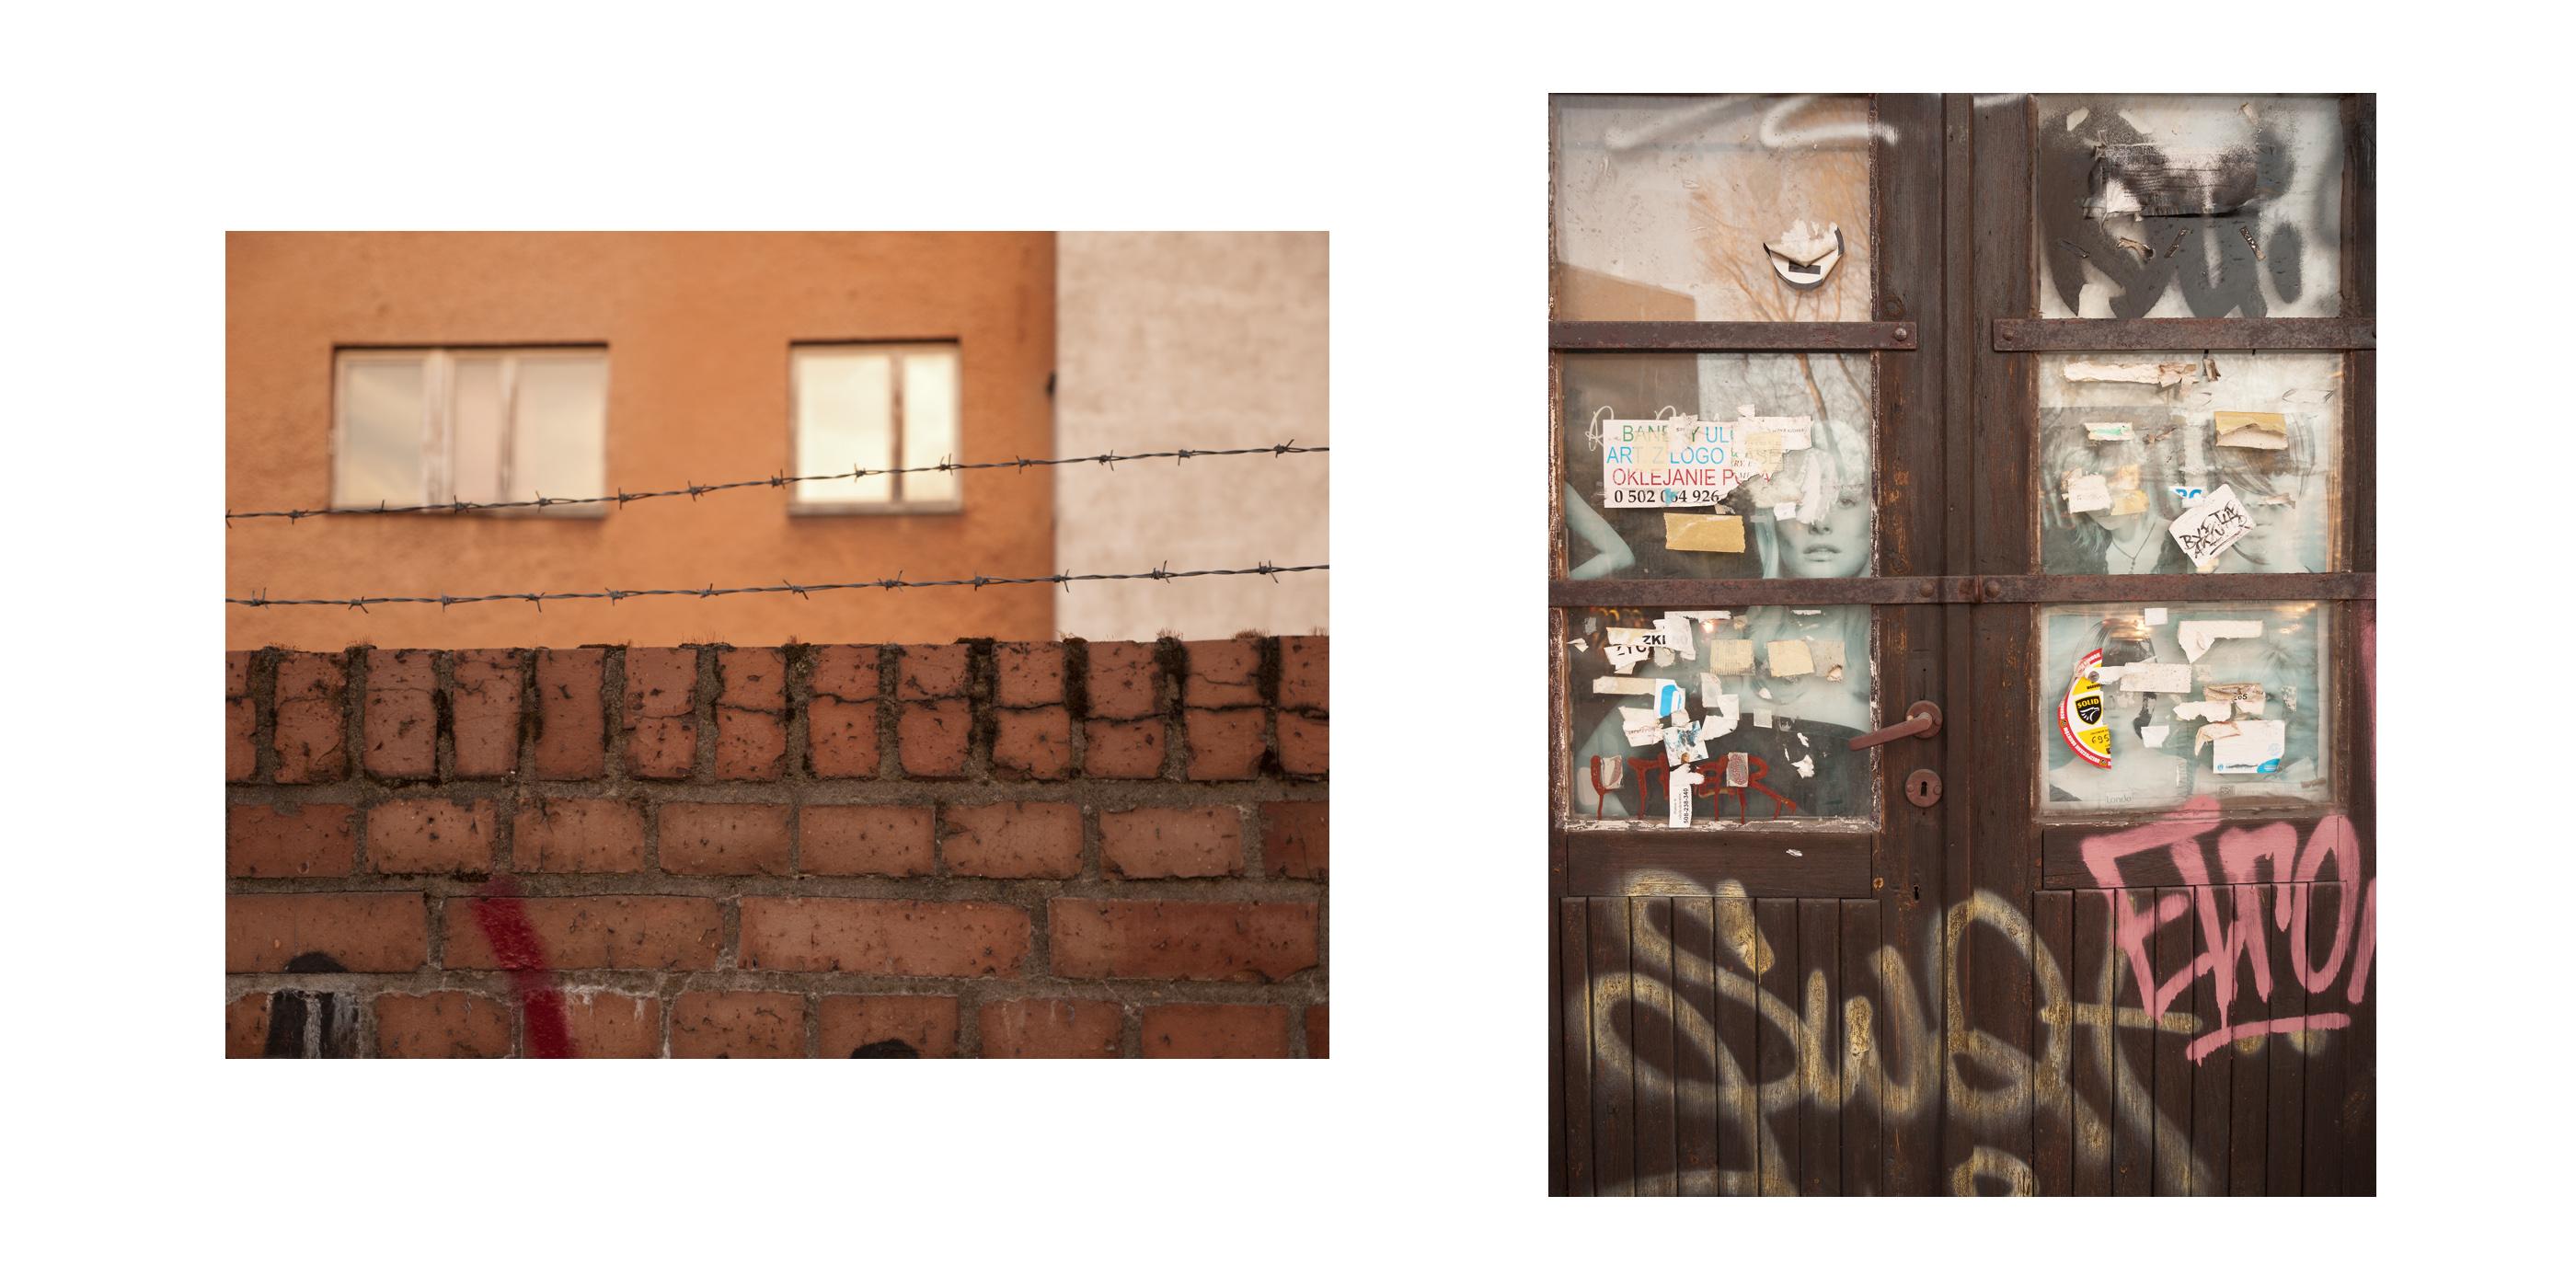 Fondos de pantalla : cara, dibujo, ventana, urbano, pared, madera ...